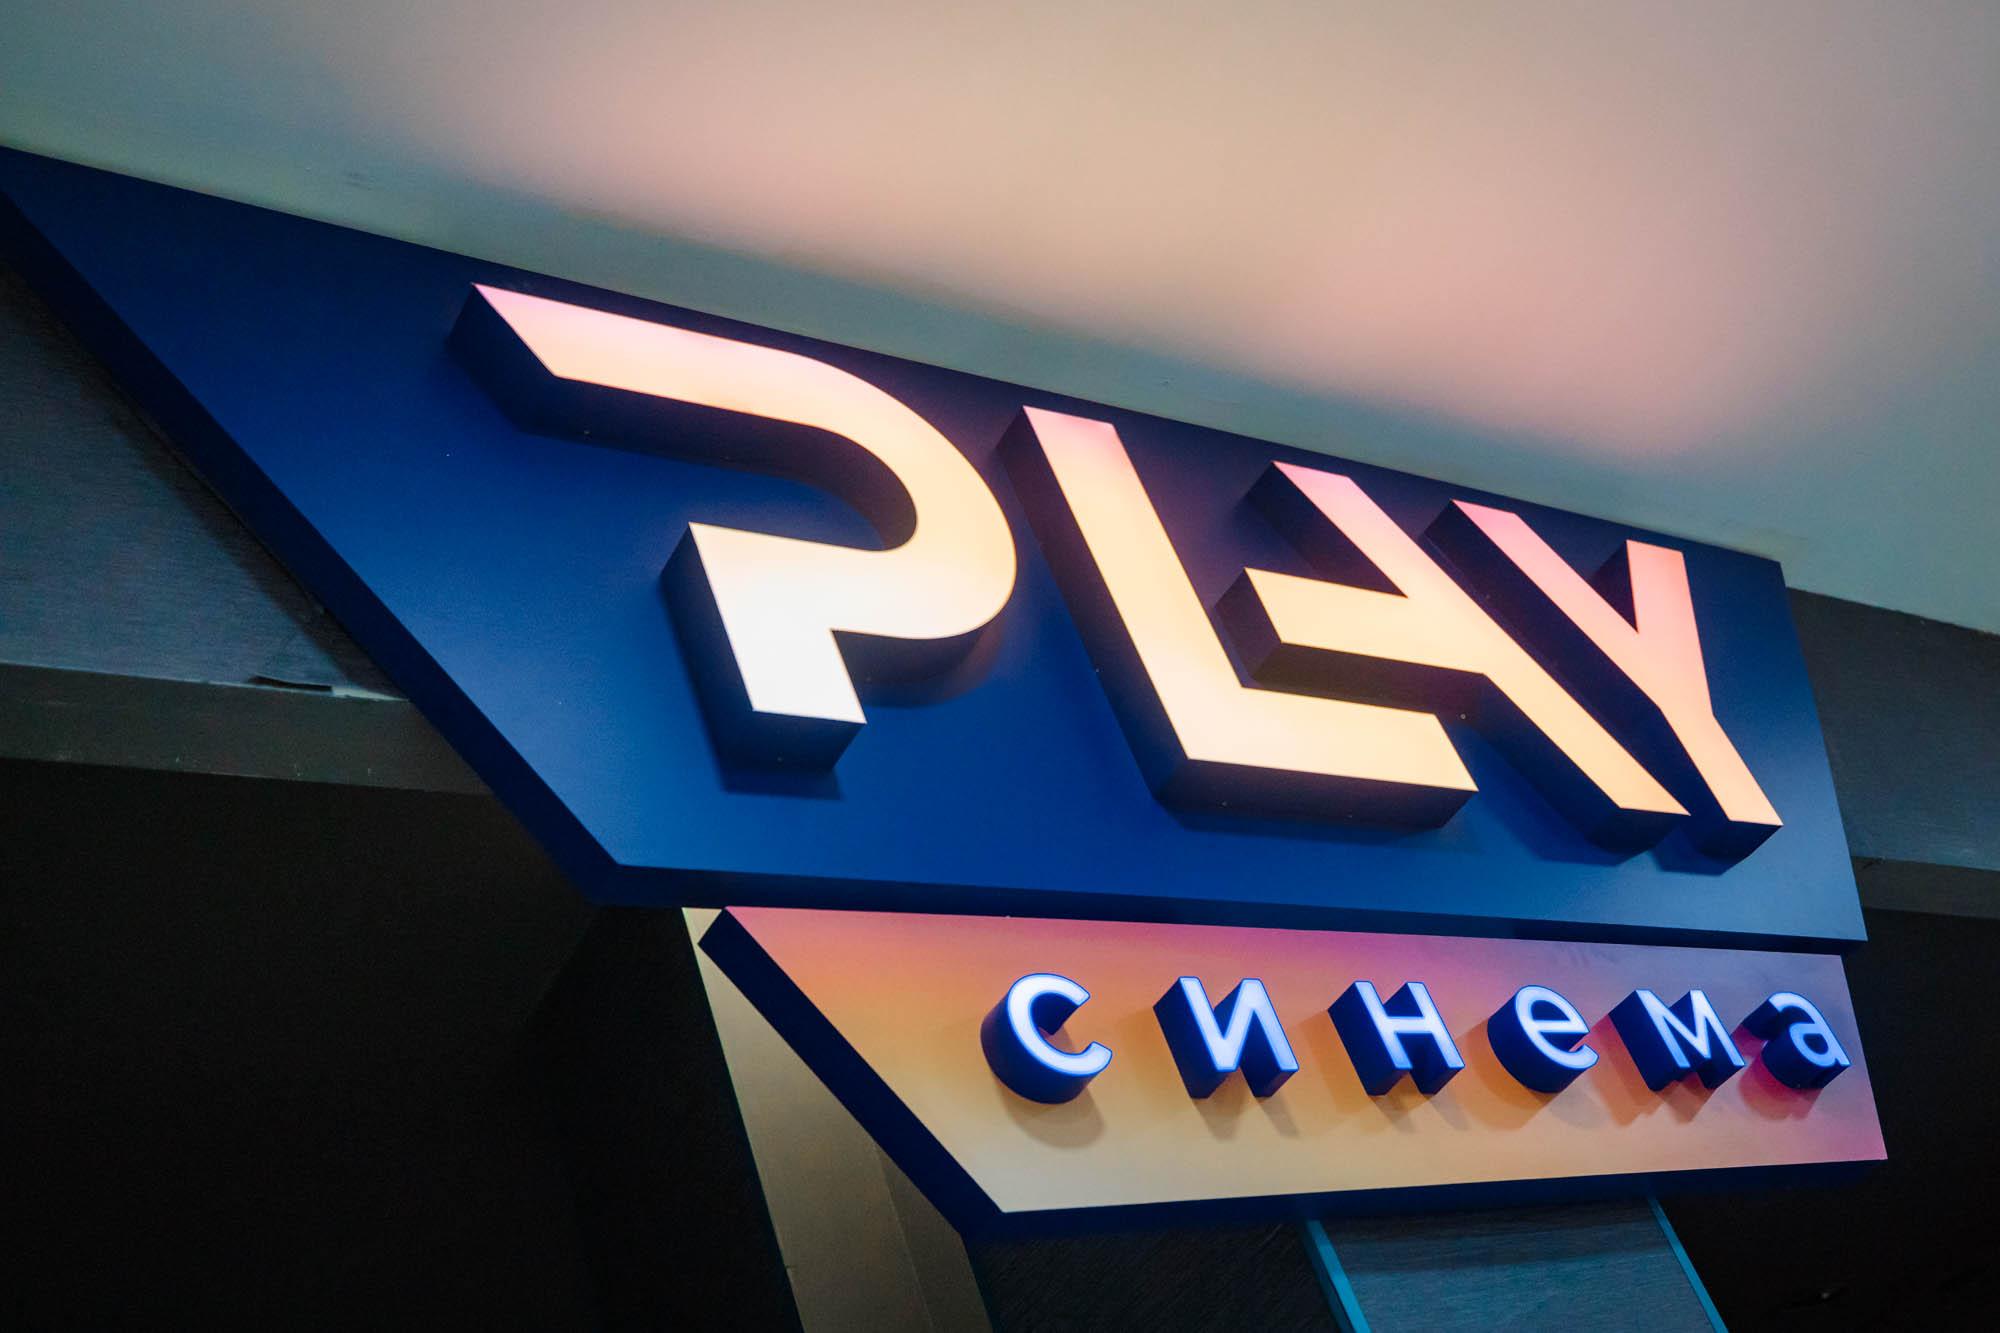 Play Cinema